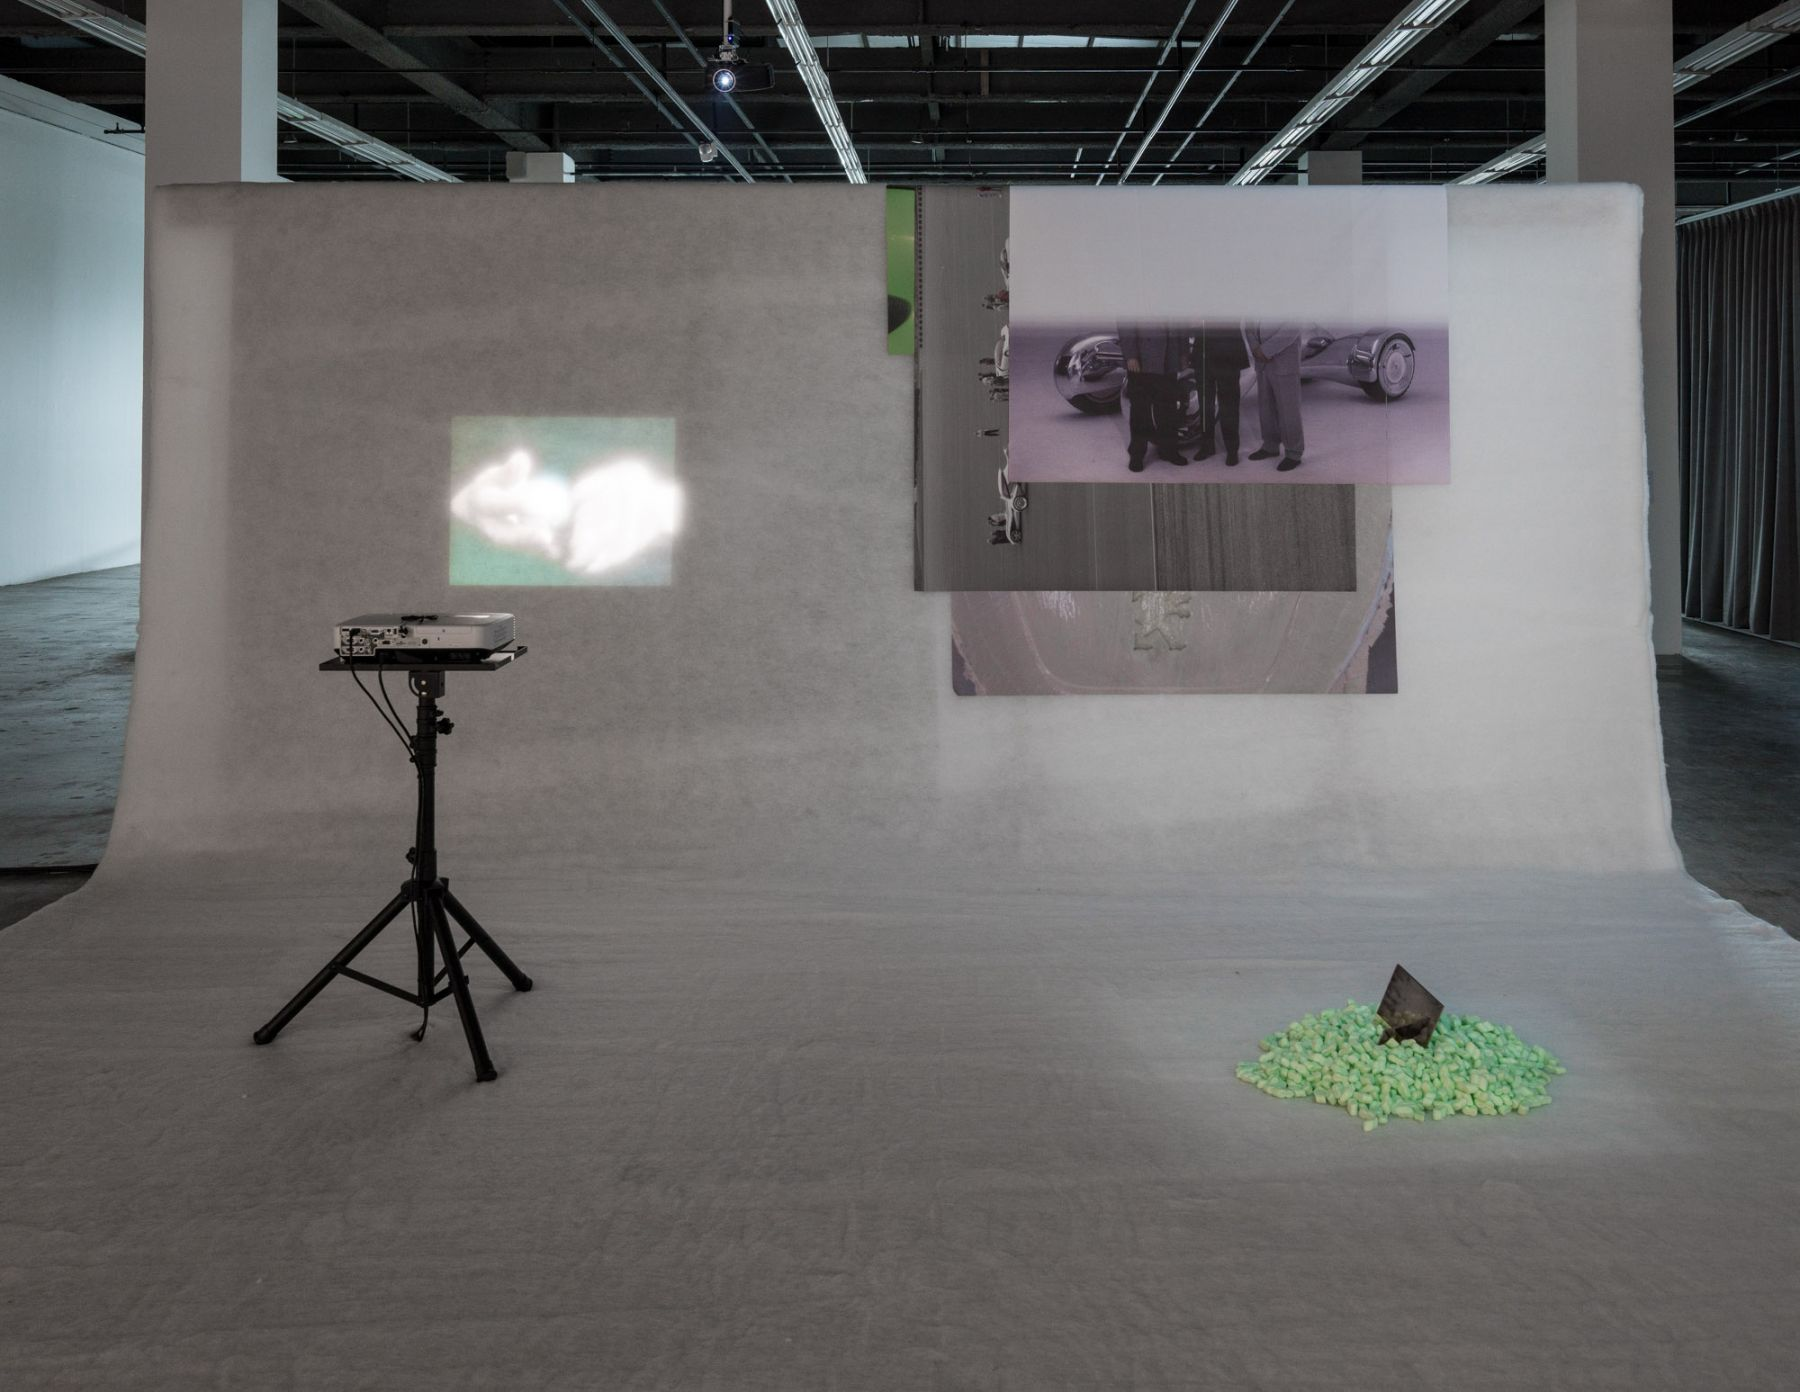 The Eighth Climate (What Does Art Do?). Installation view, 2016. 11th Gwangju Biennale, South Korea.